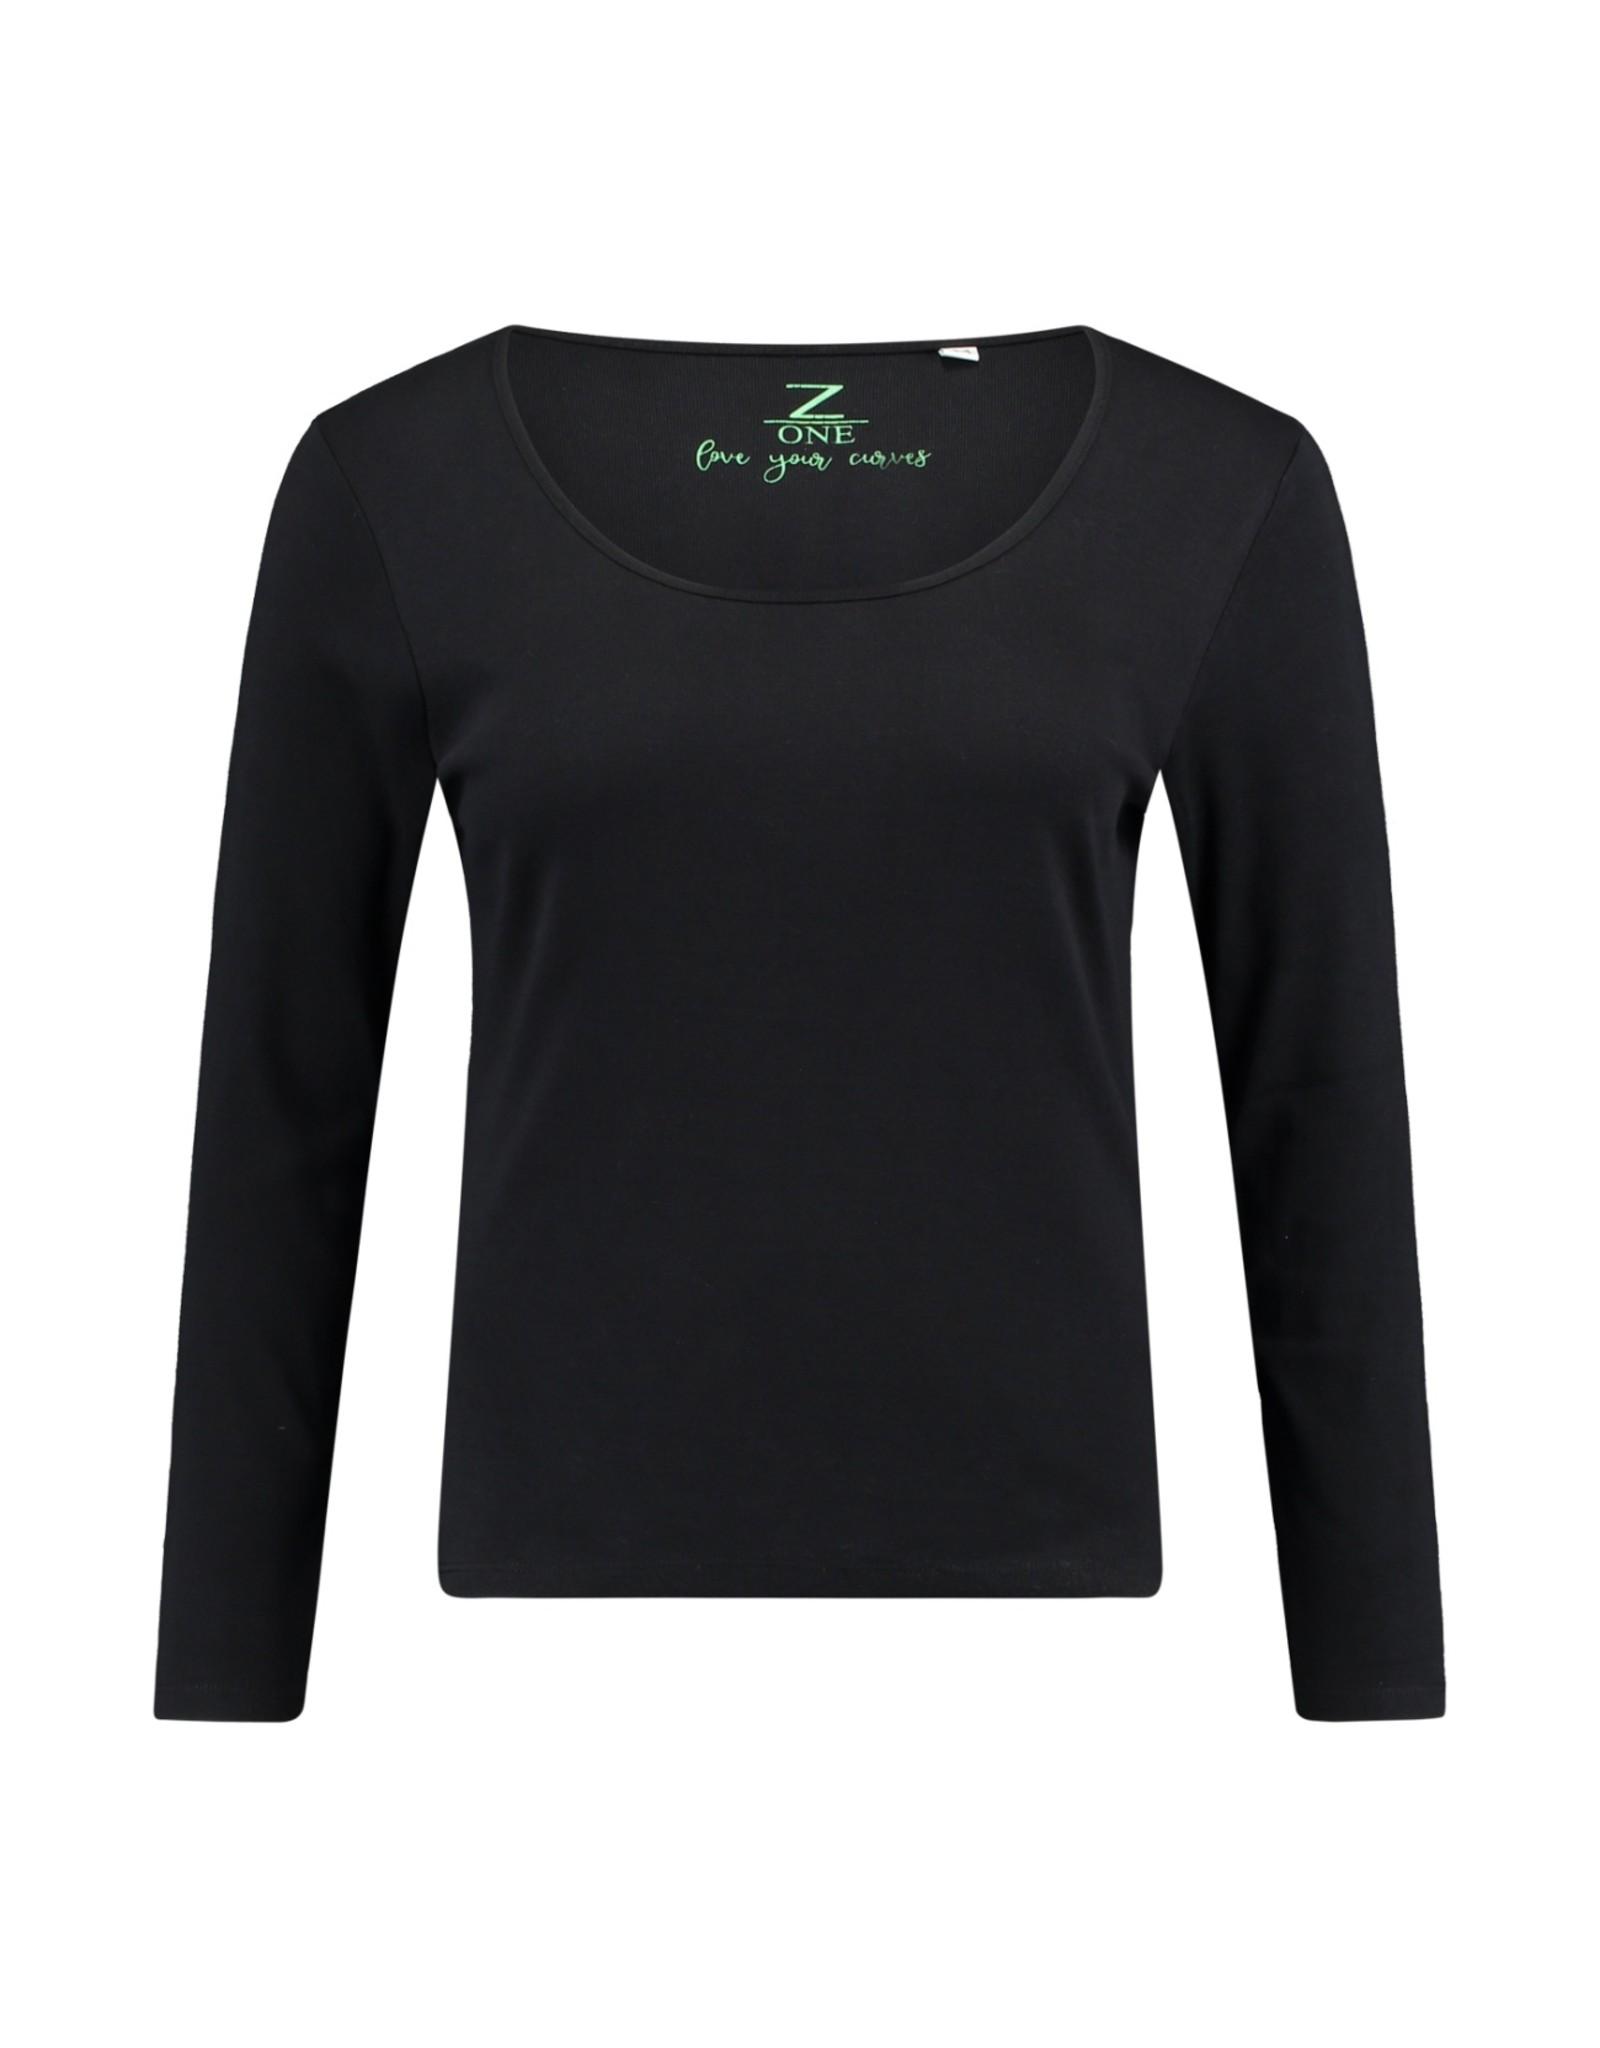 Z-ONE T-shirt Donna Z1 Black